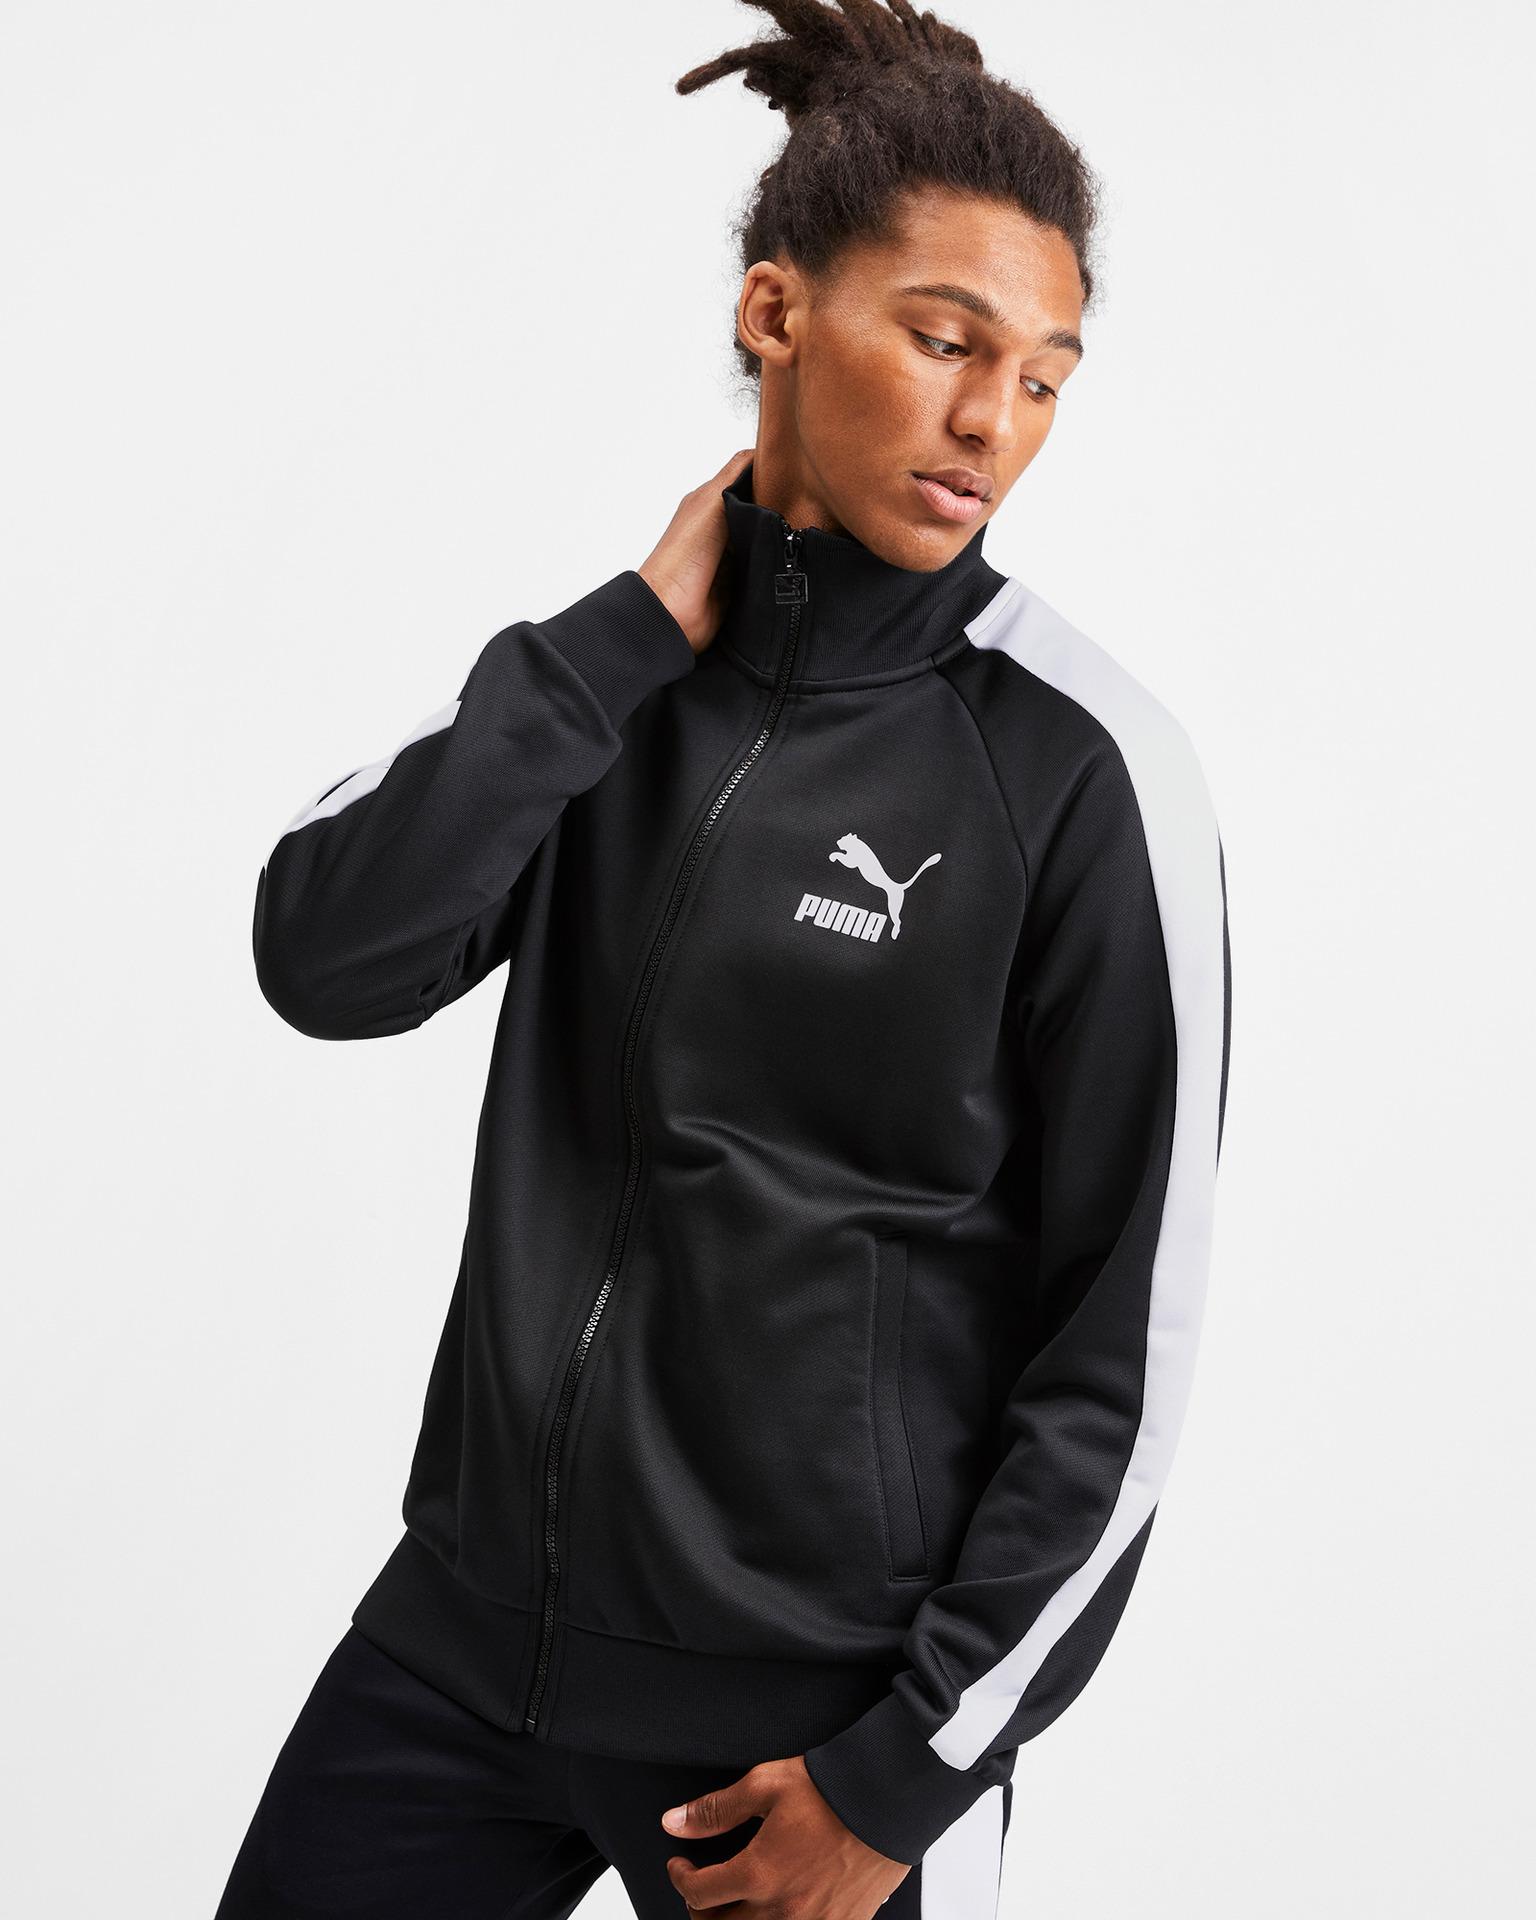 Puma - Iconic T7 Sweatshirt Bibloo.com